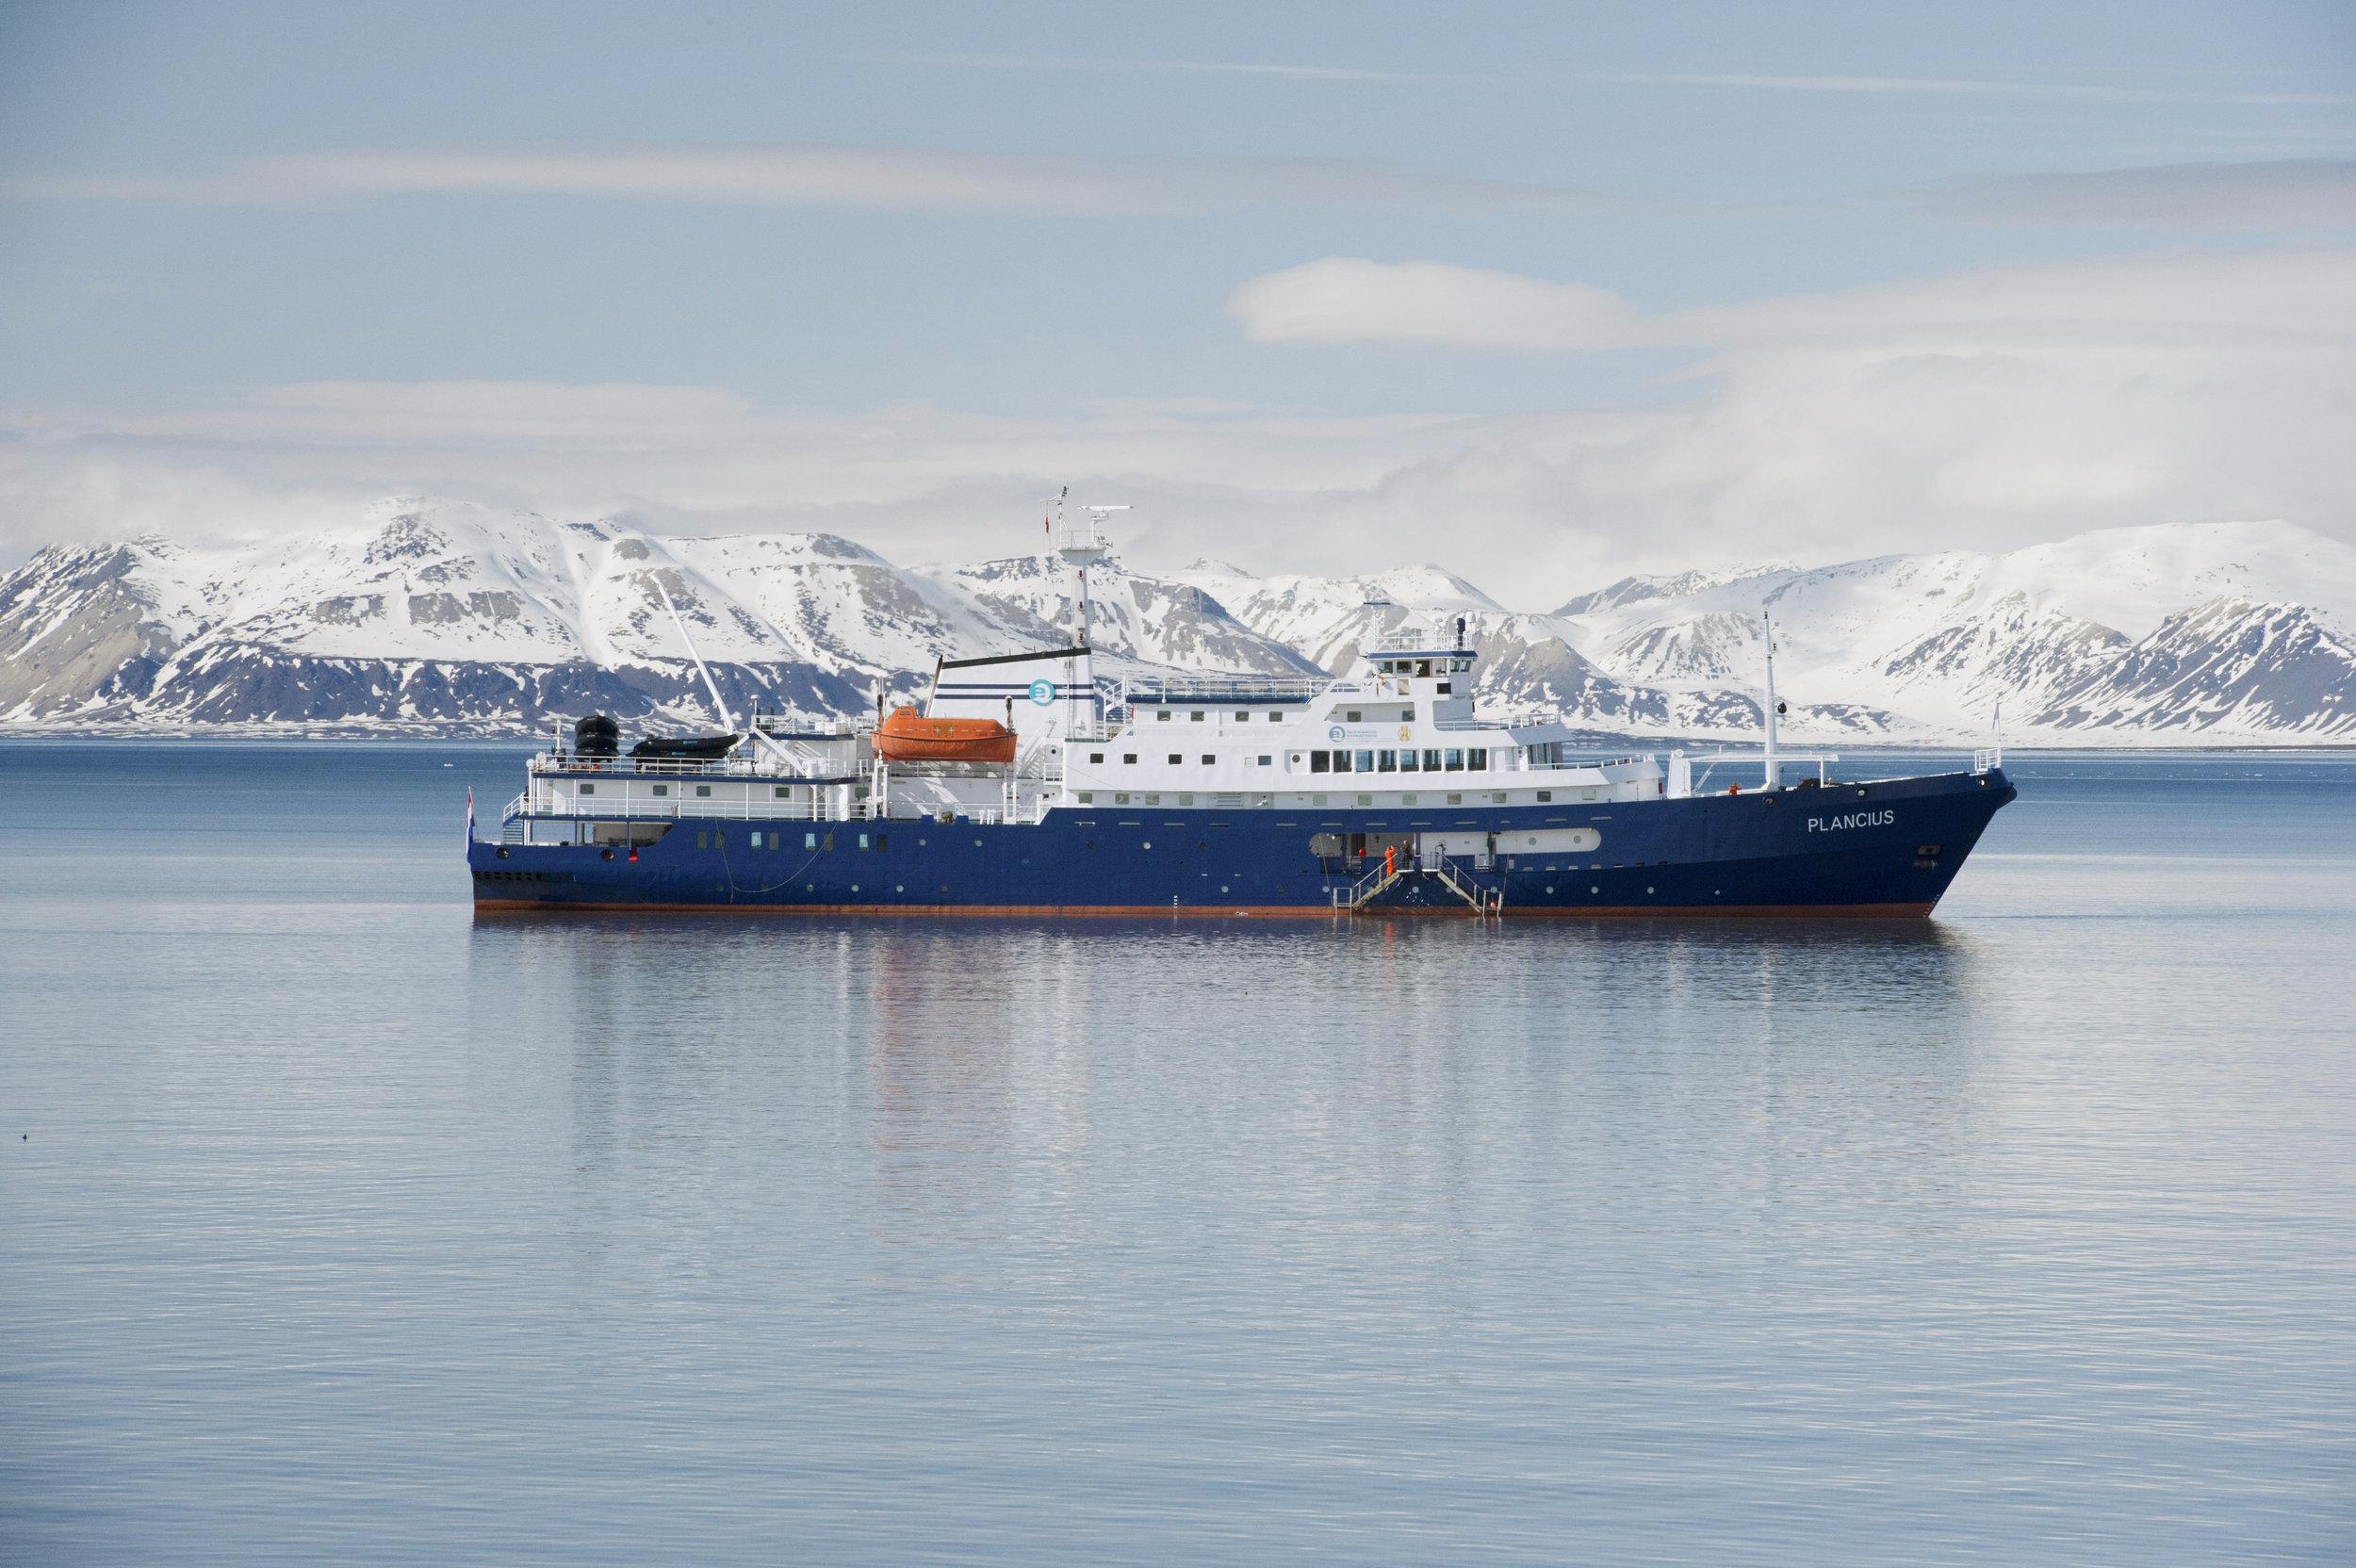 Plancius at Ny Alesund, Spitsbergen_Josh Harrison.jpeg